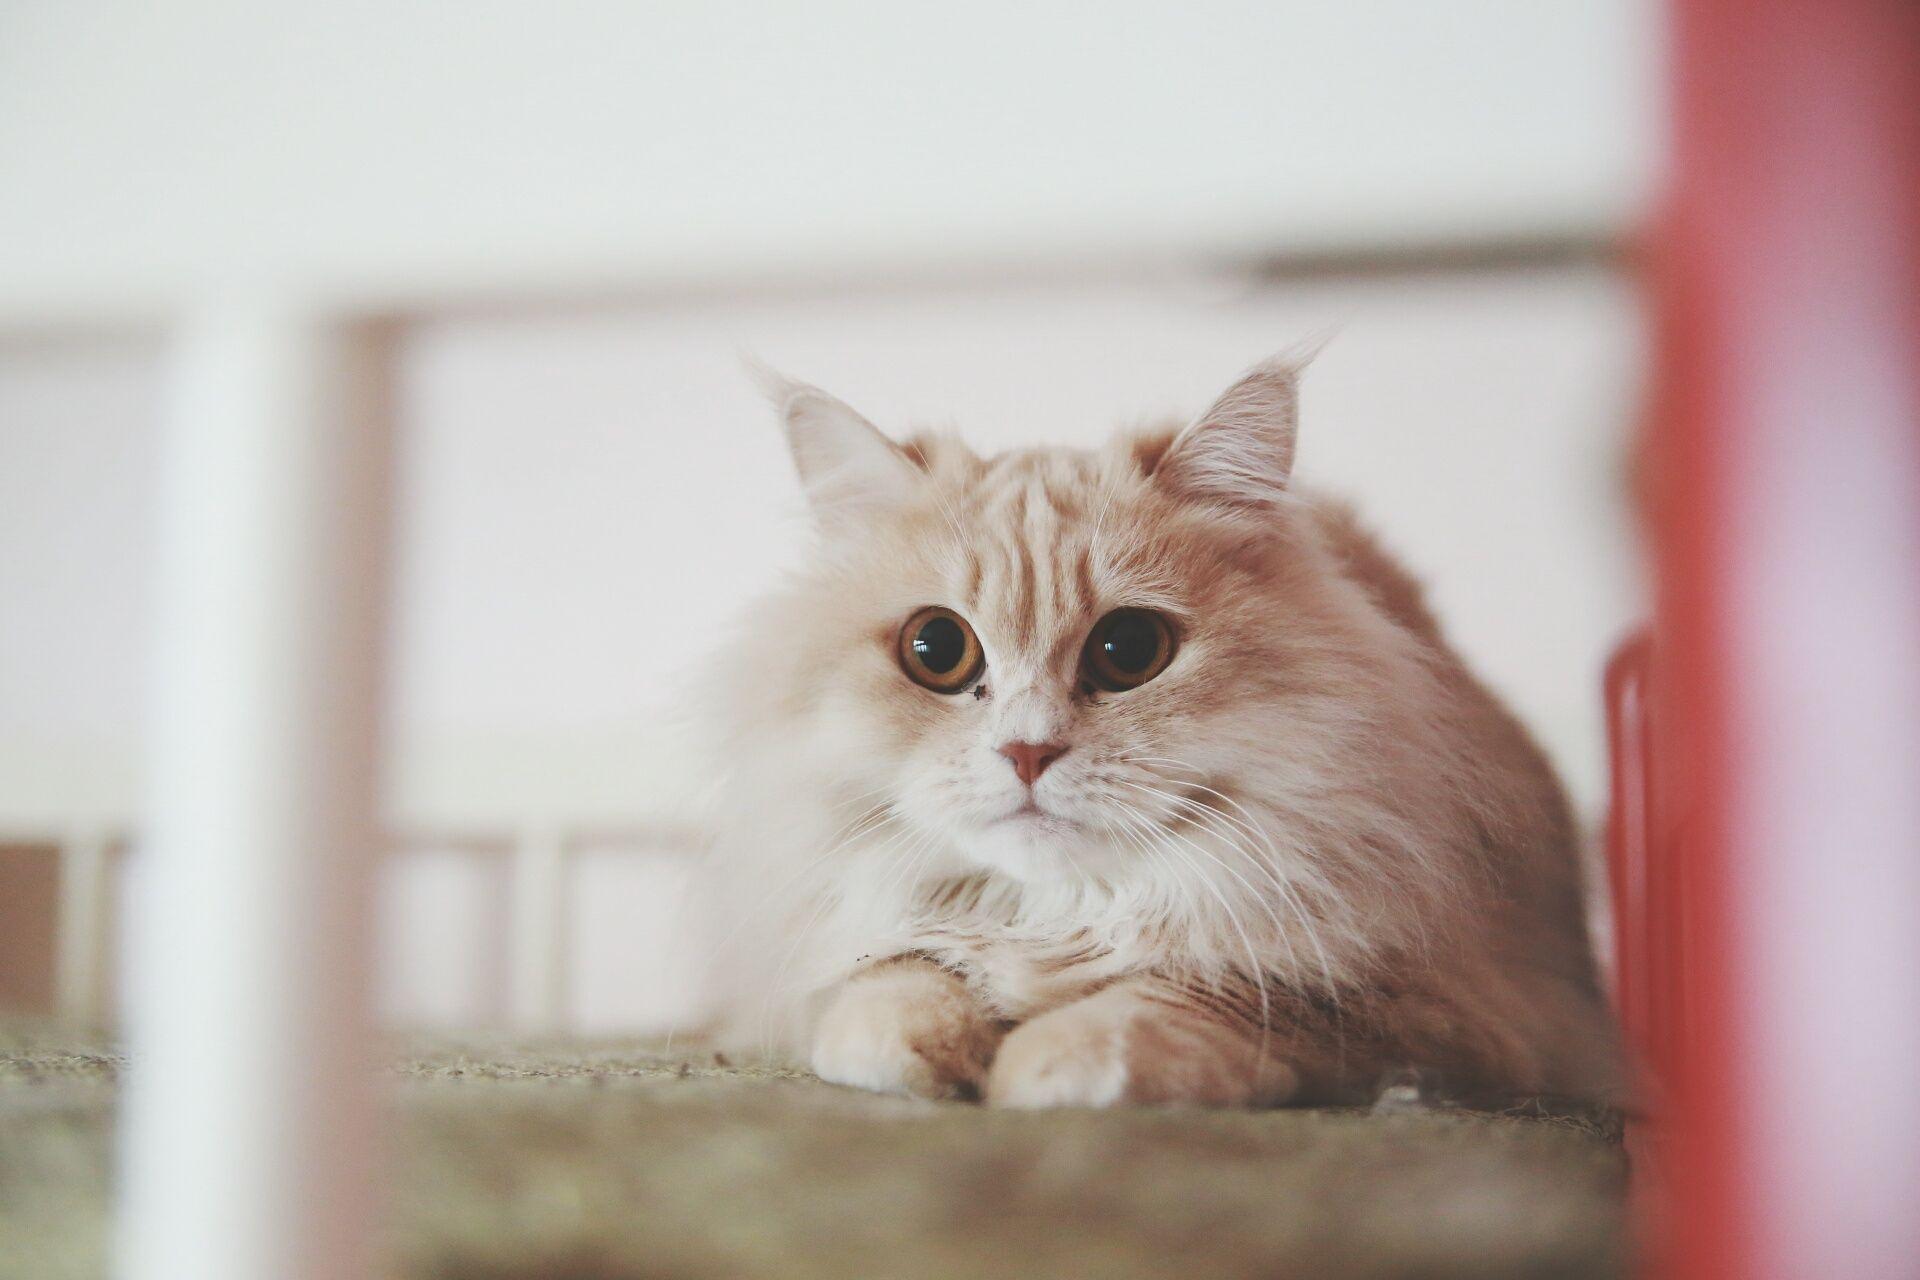 A Turkish Angora cat looking into the camera.